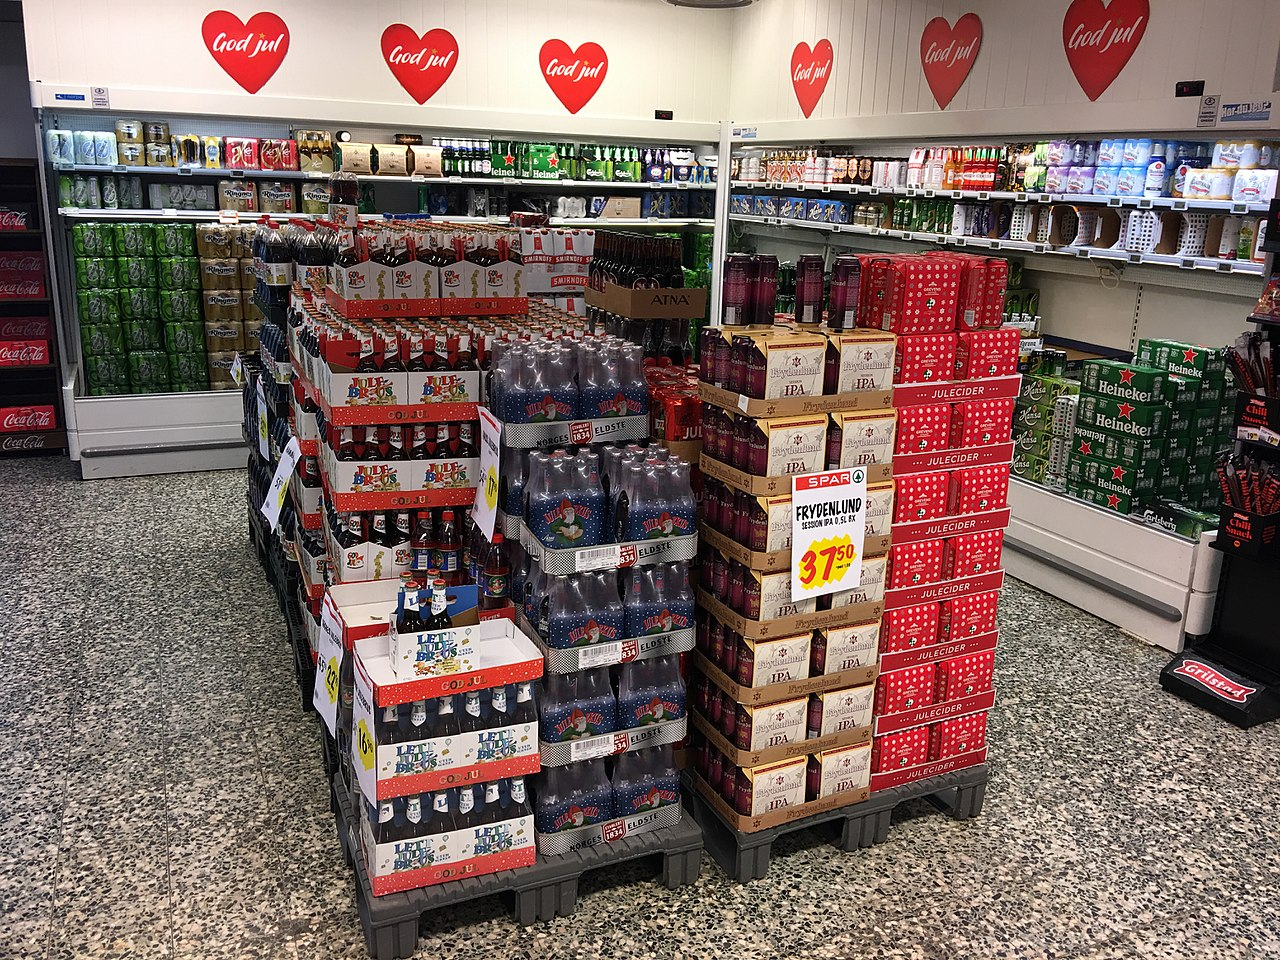 FileNorwegian Christmas Soda And Beers Ringnes Aass Julebrus Lettjulebrus Frydenlund IPA Julecider Heineken Etc In Freezer Chiller Showcase